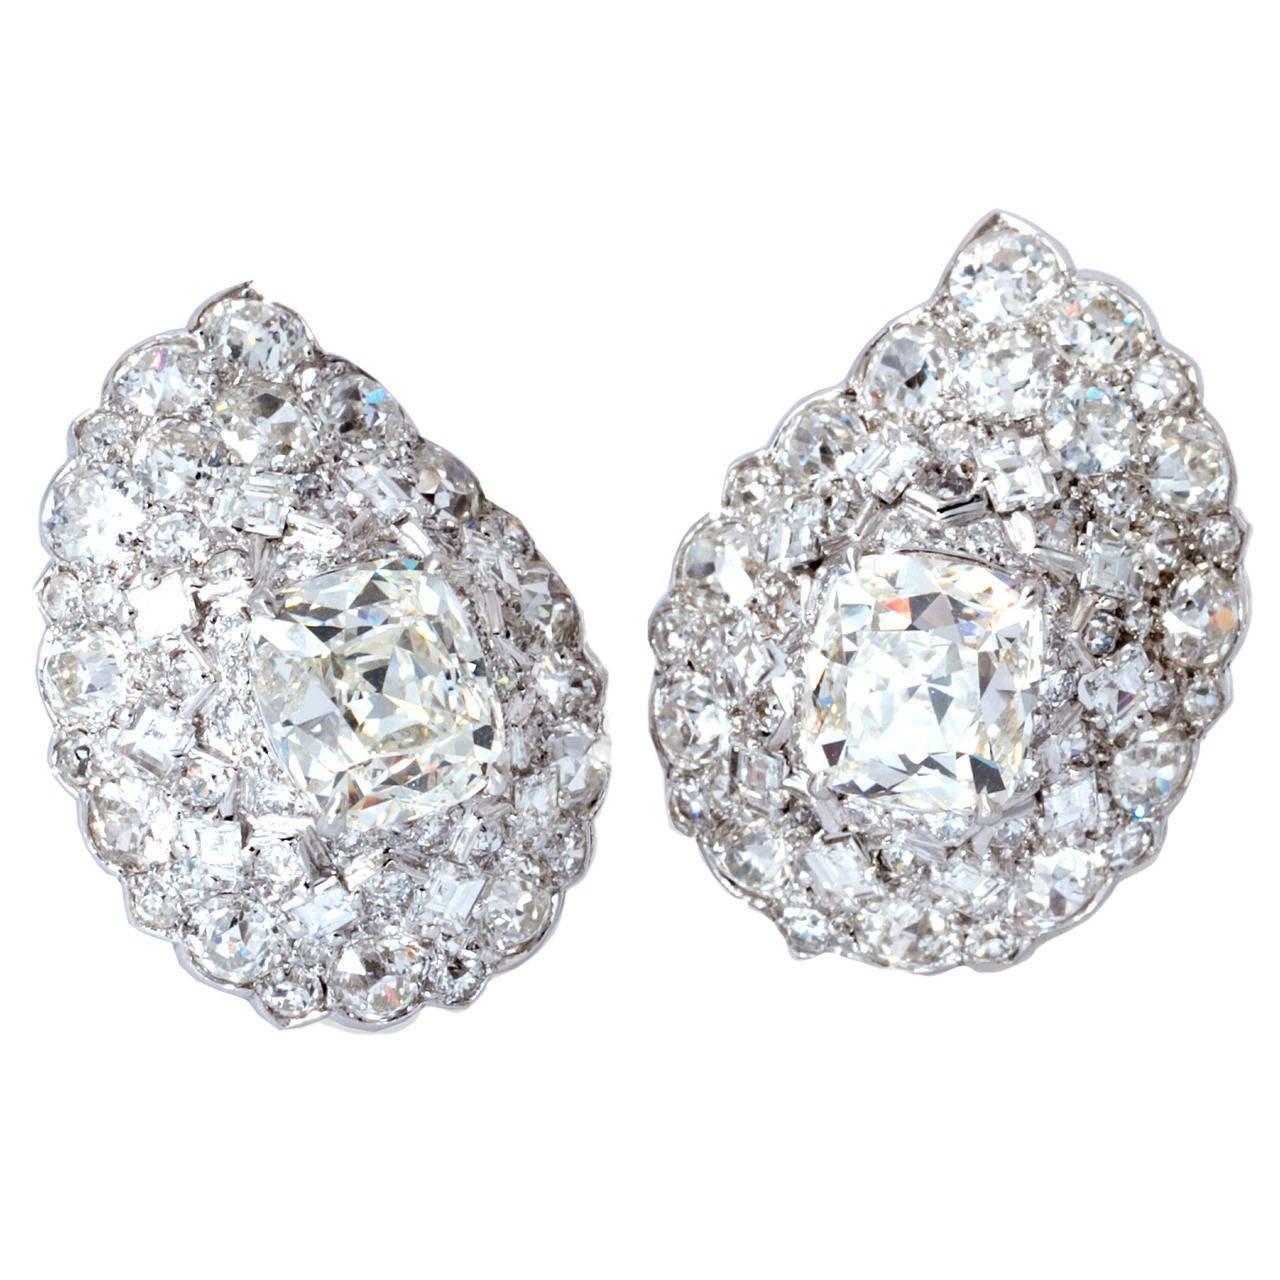 Cartier Diamond Earrings For Sale At 1stdibs